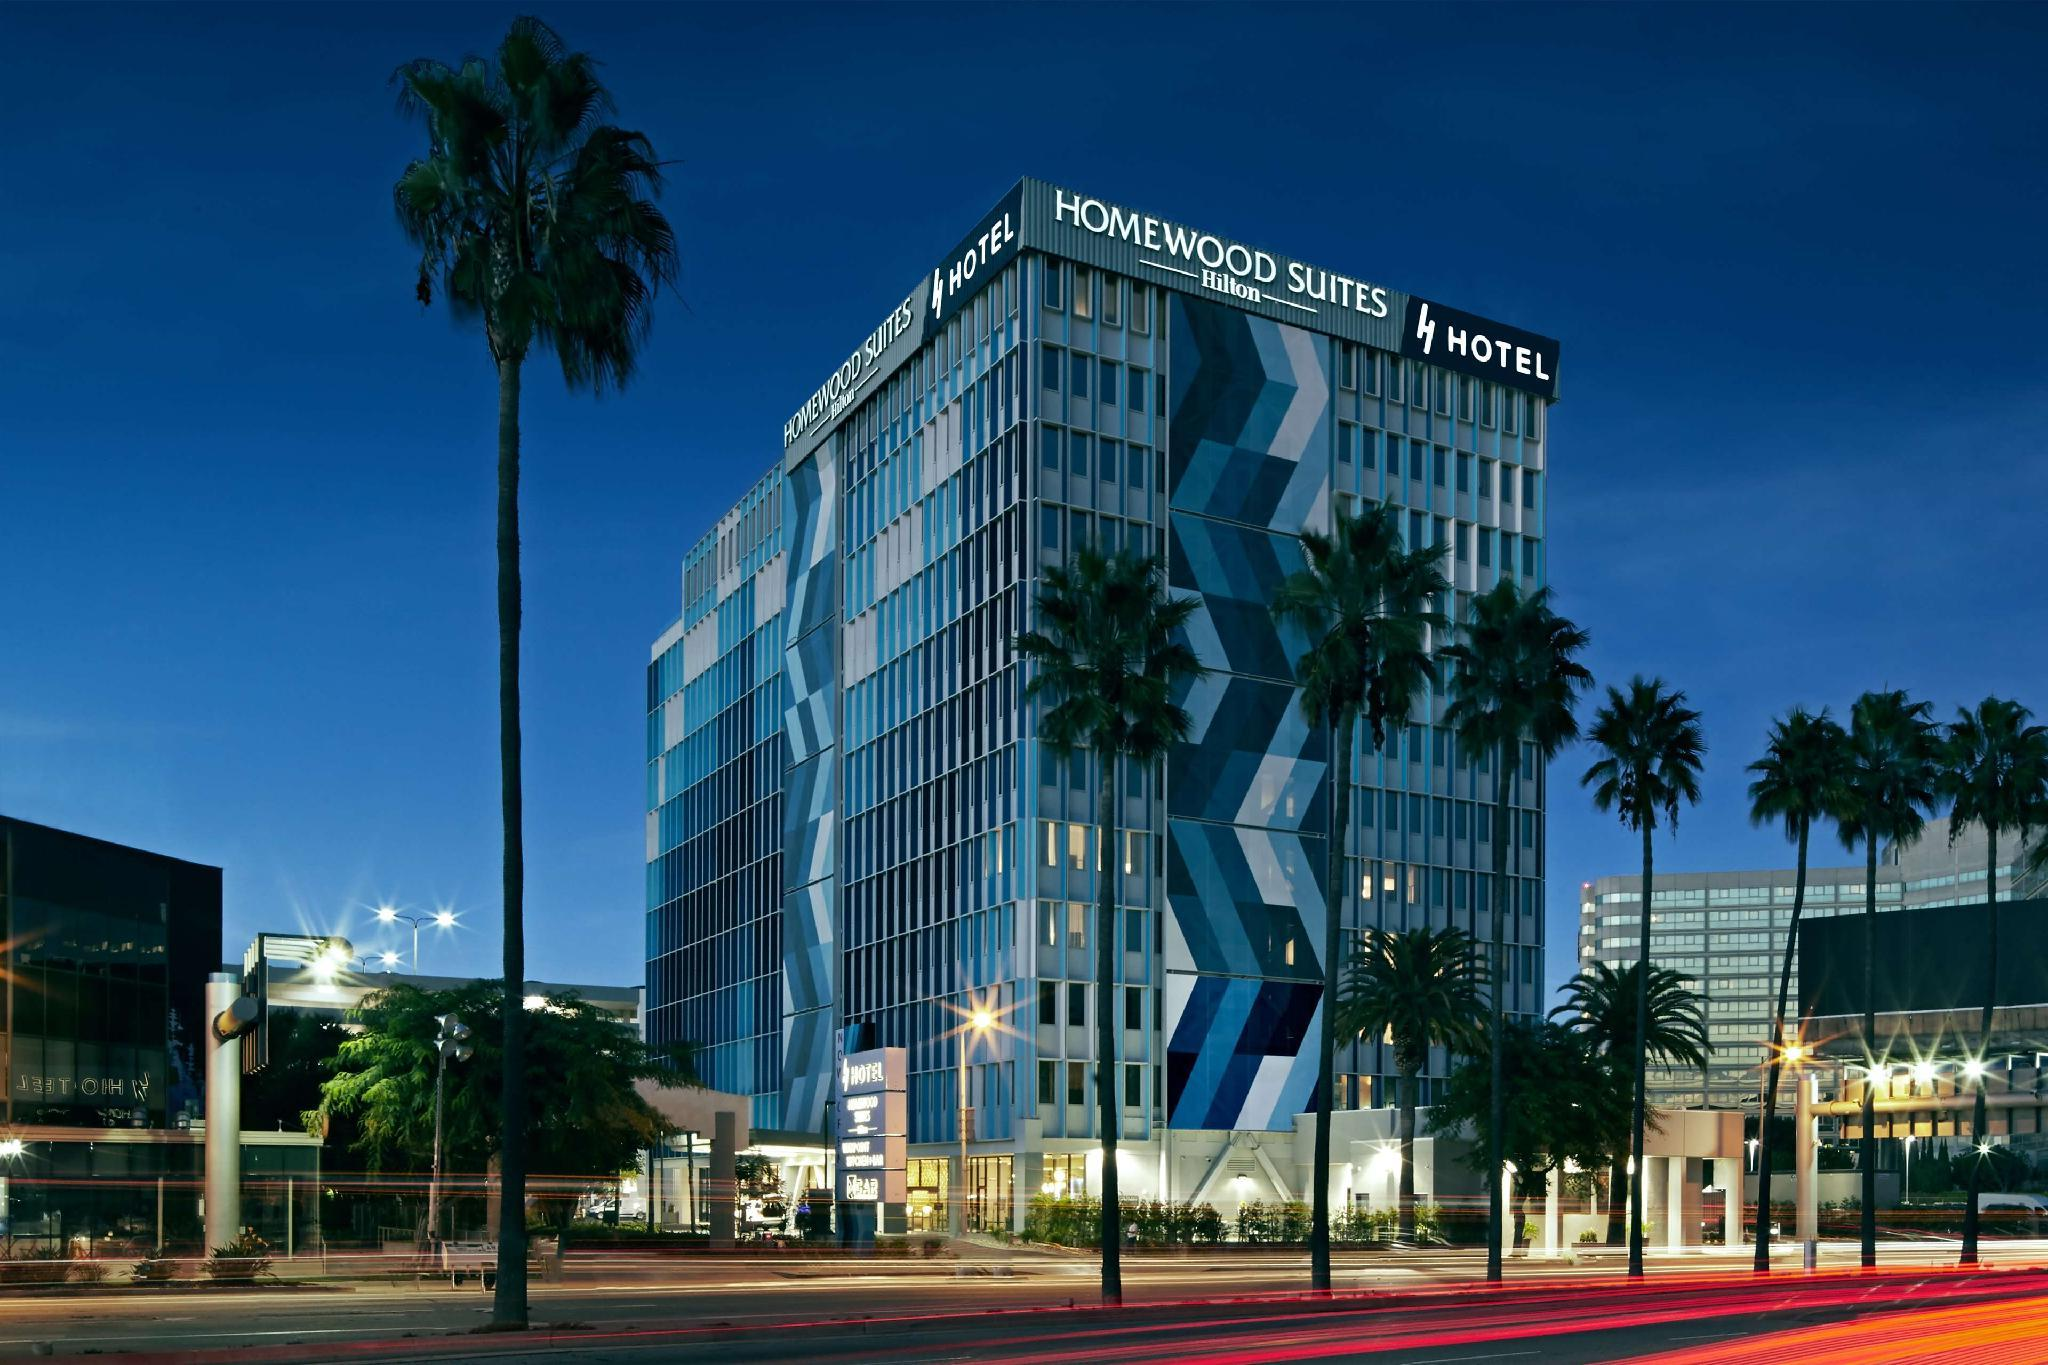 Homewood Suites By Hilton Los Angeles Intl Airport